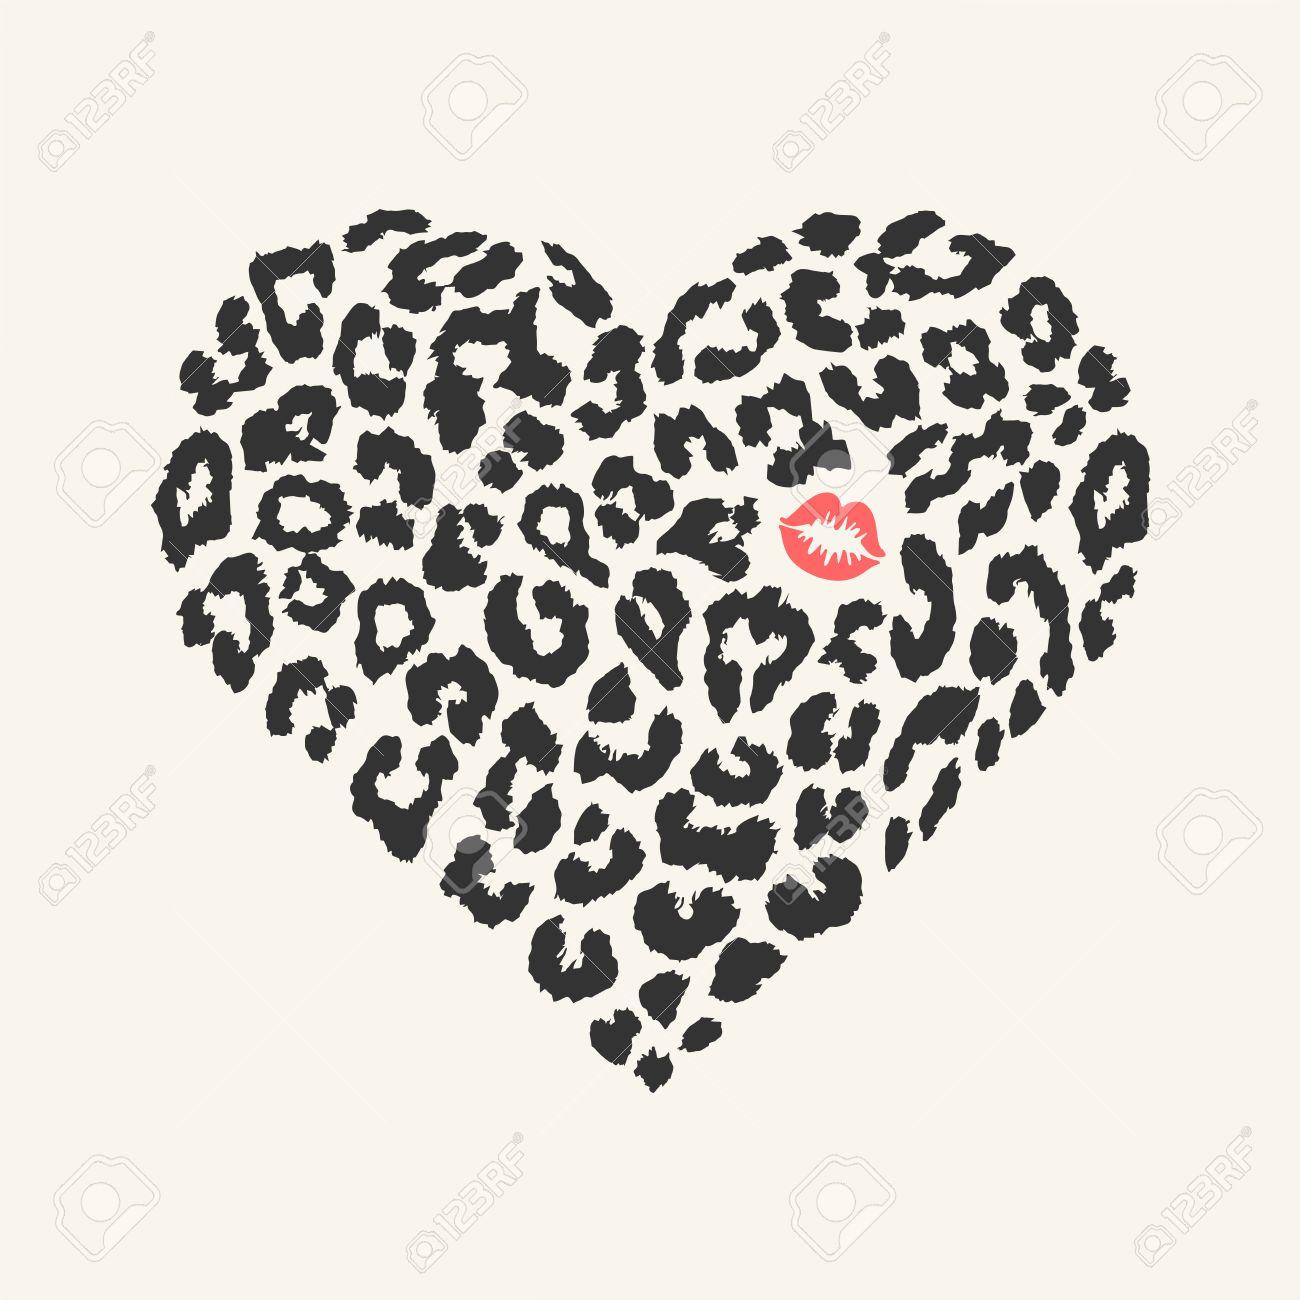 Vector heart shape - Leopard texture with kiss print - 35116903